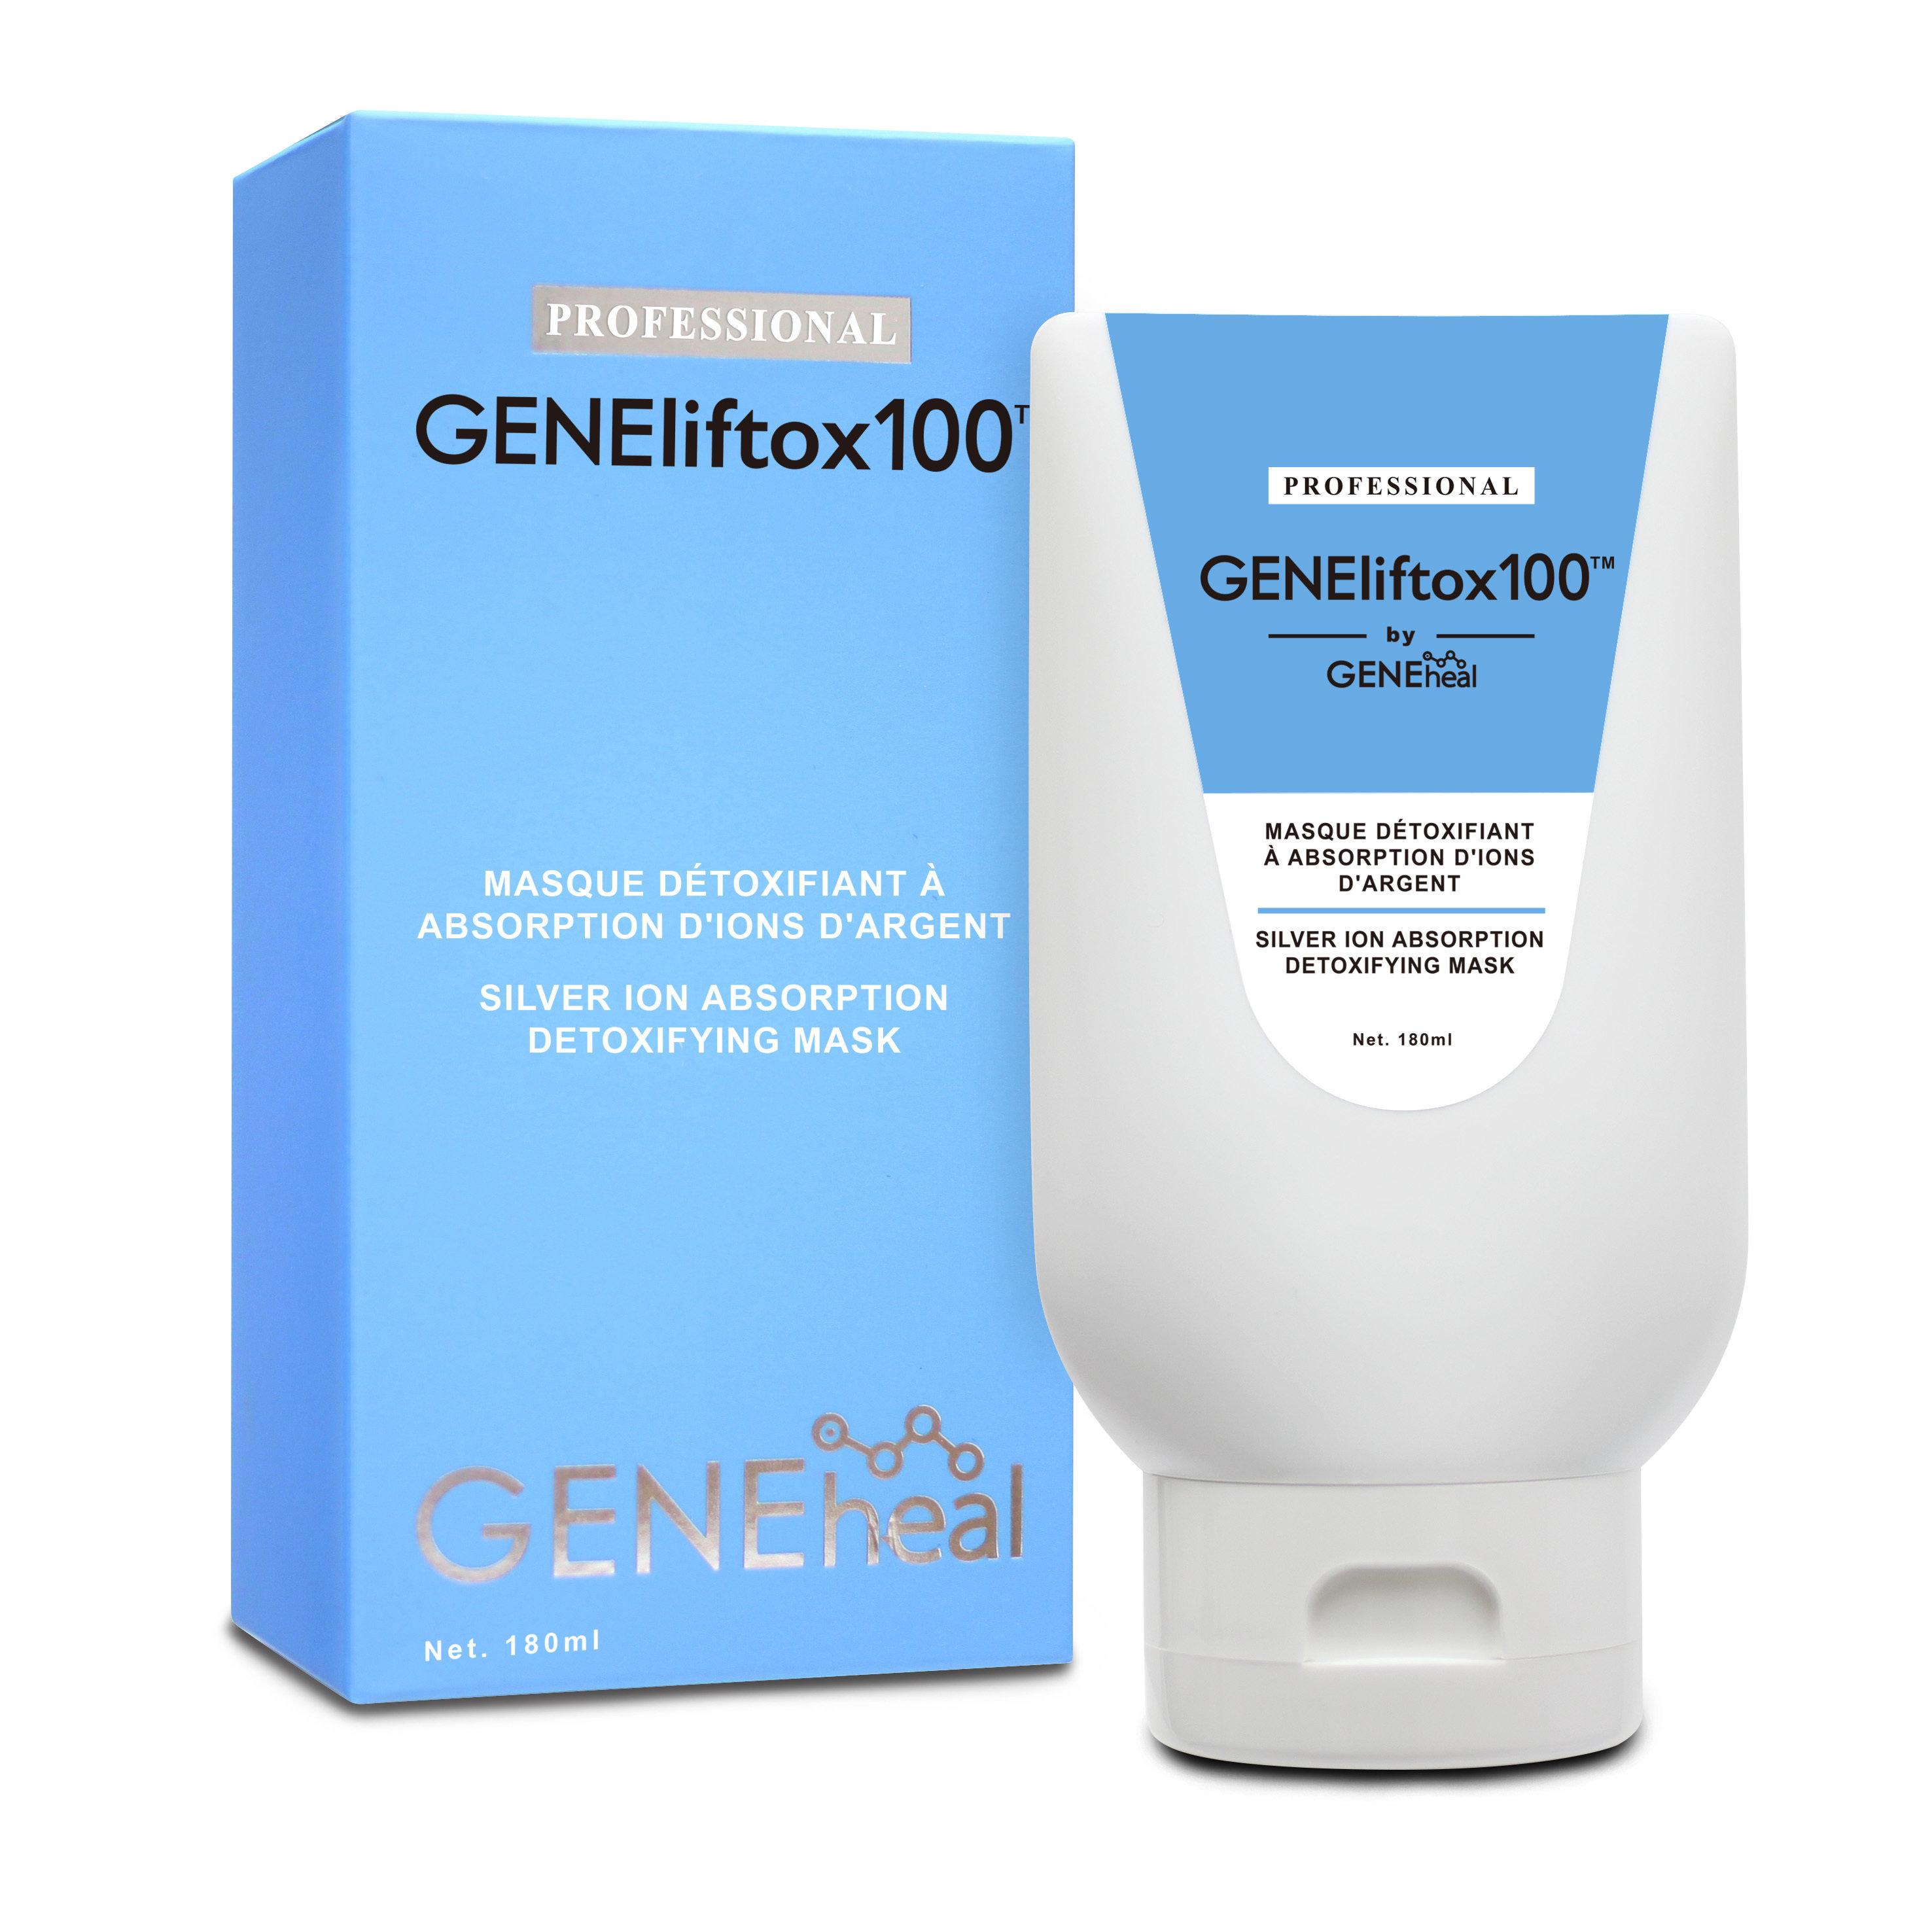 GENElitox 100 - 銀離子・吸附 排毒淨顏面膜 GH-E-18-014-P